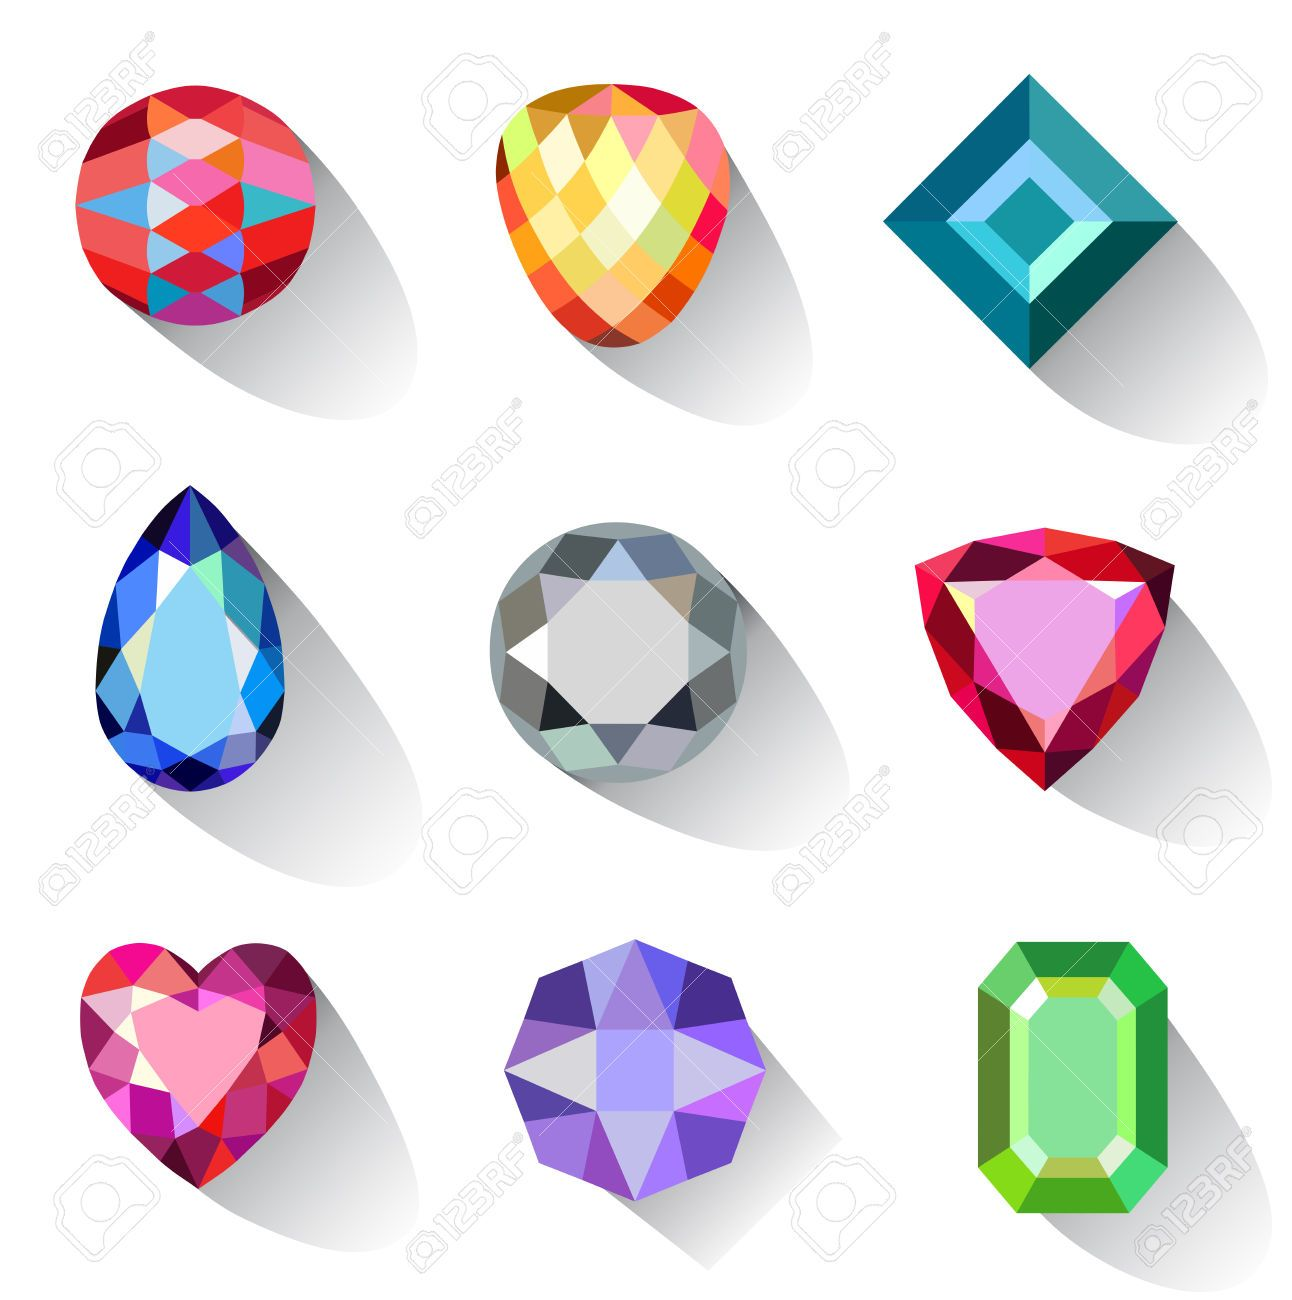 jewelry illustration - Google Search